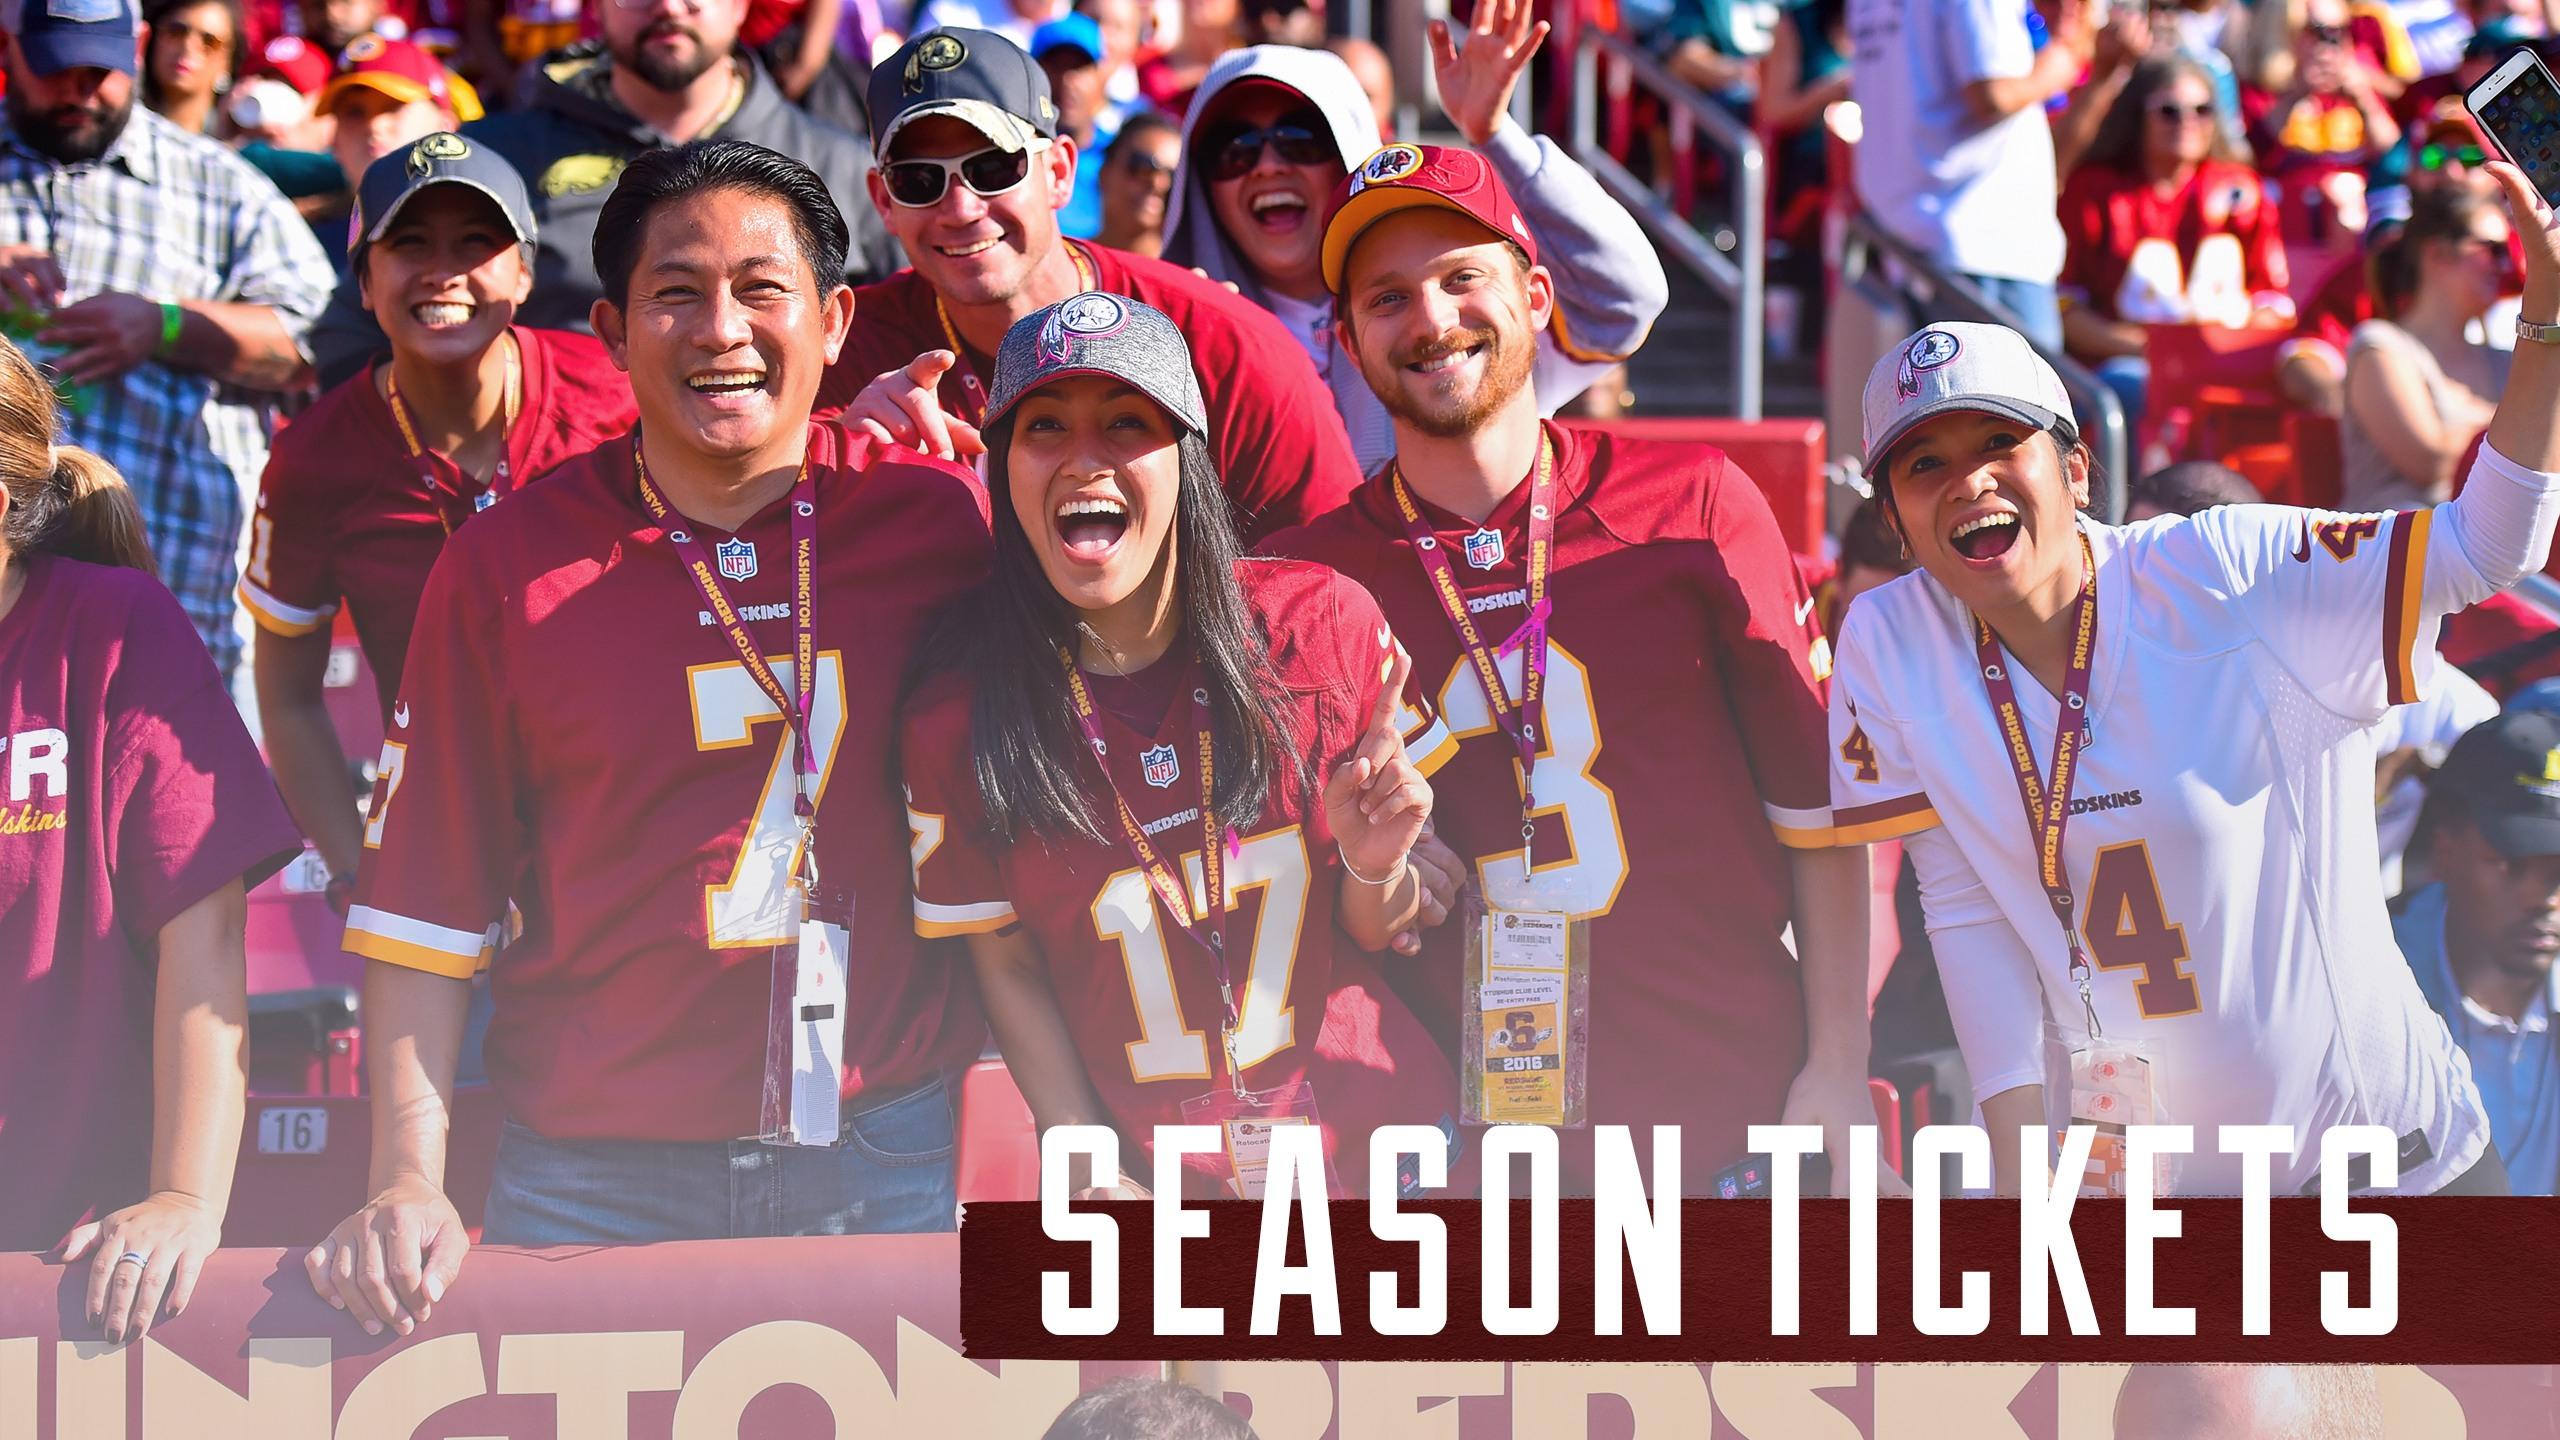 2b31b302 Redskins Tickets | Washington Redskins - Redskins.com